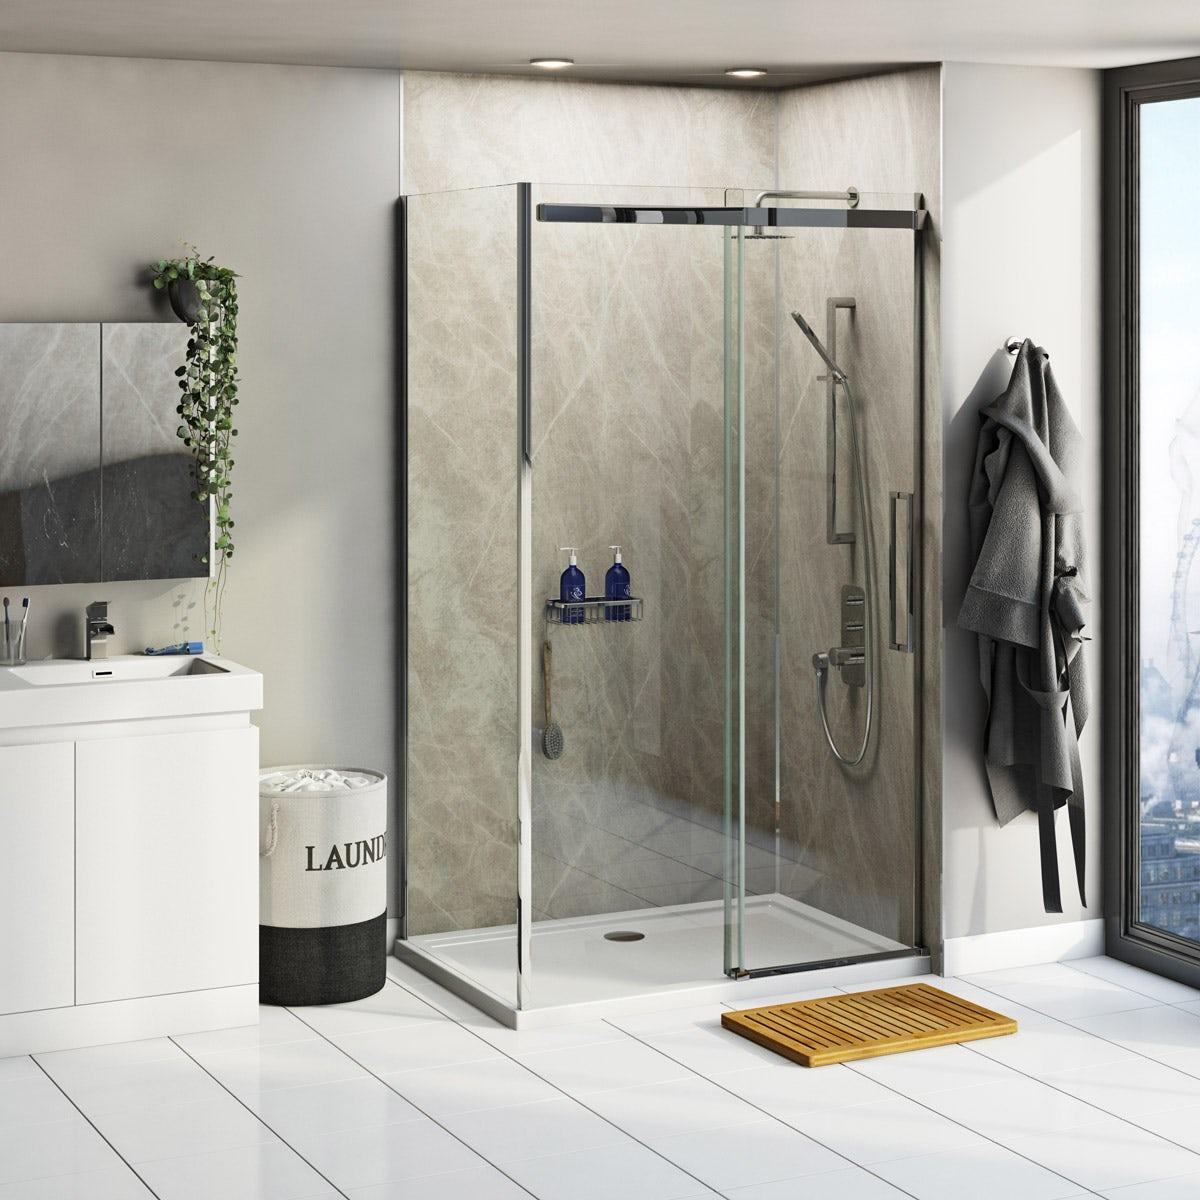 Multipanel linda barker soapstone stellar shower wall - Shower wall material ideas ...